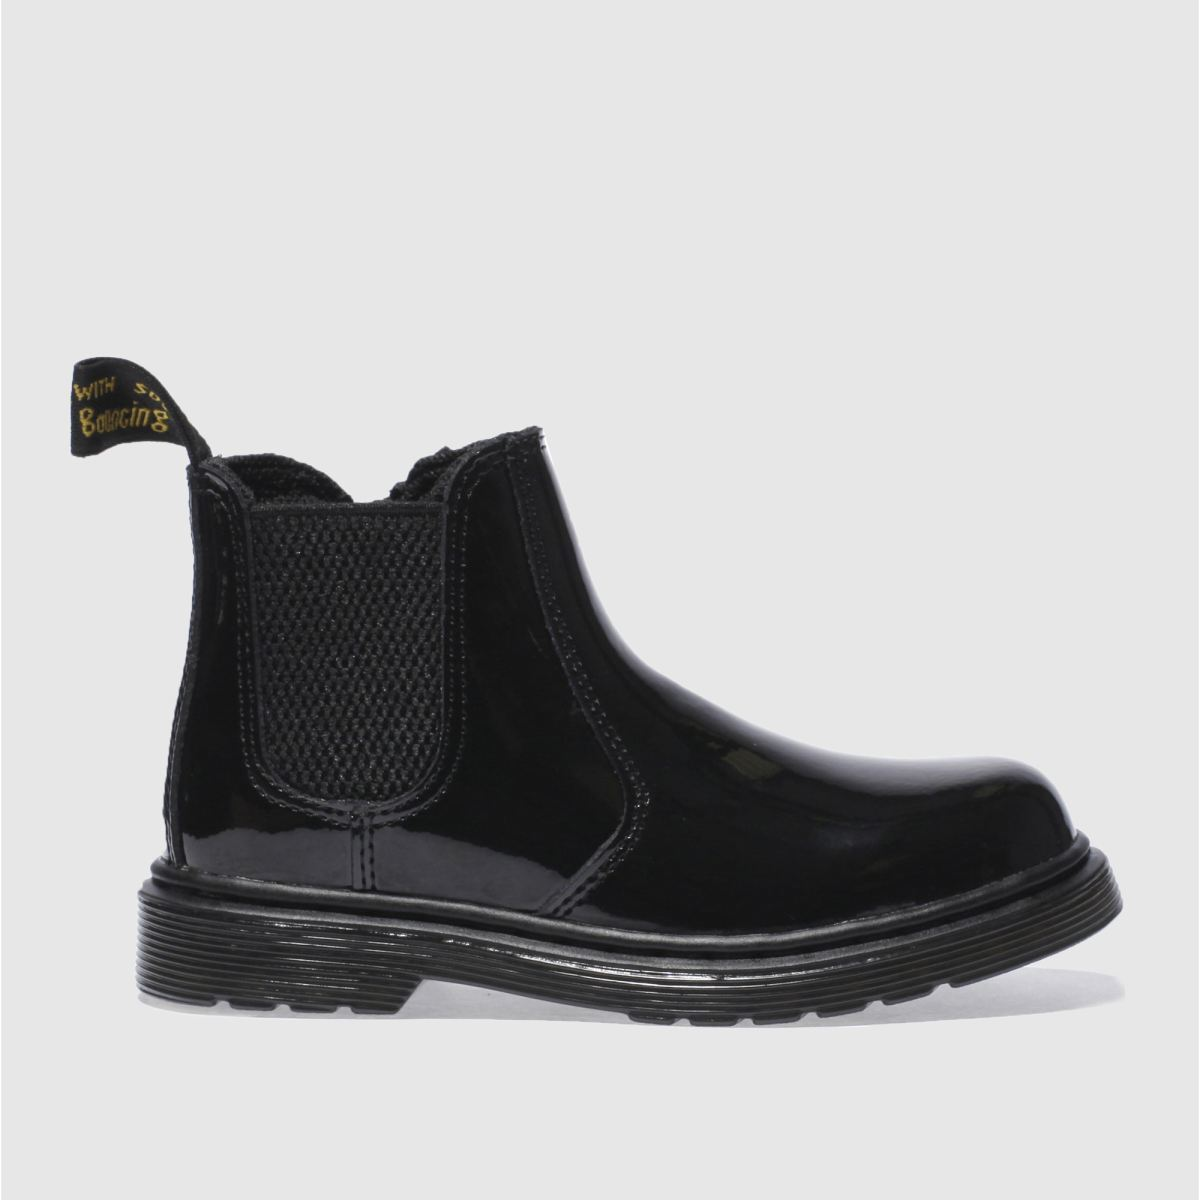 Dr Martens Black 2976 Girls Junior Boots